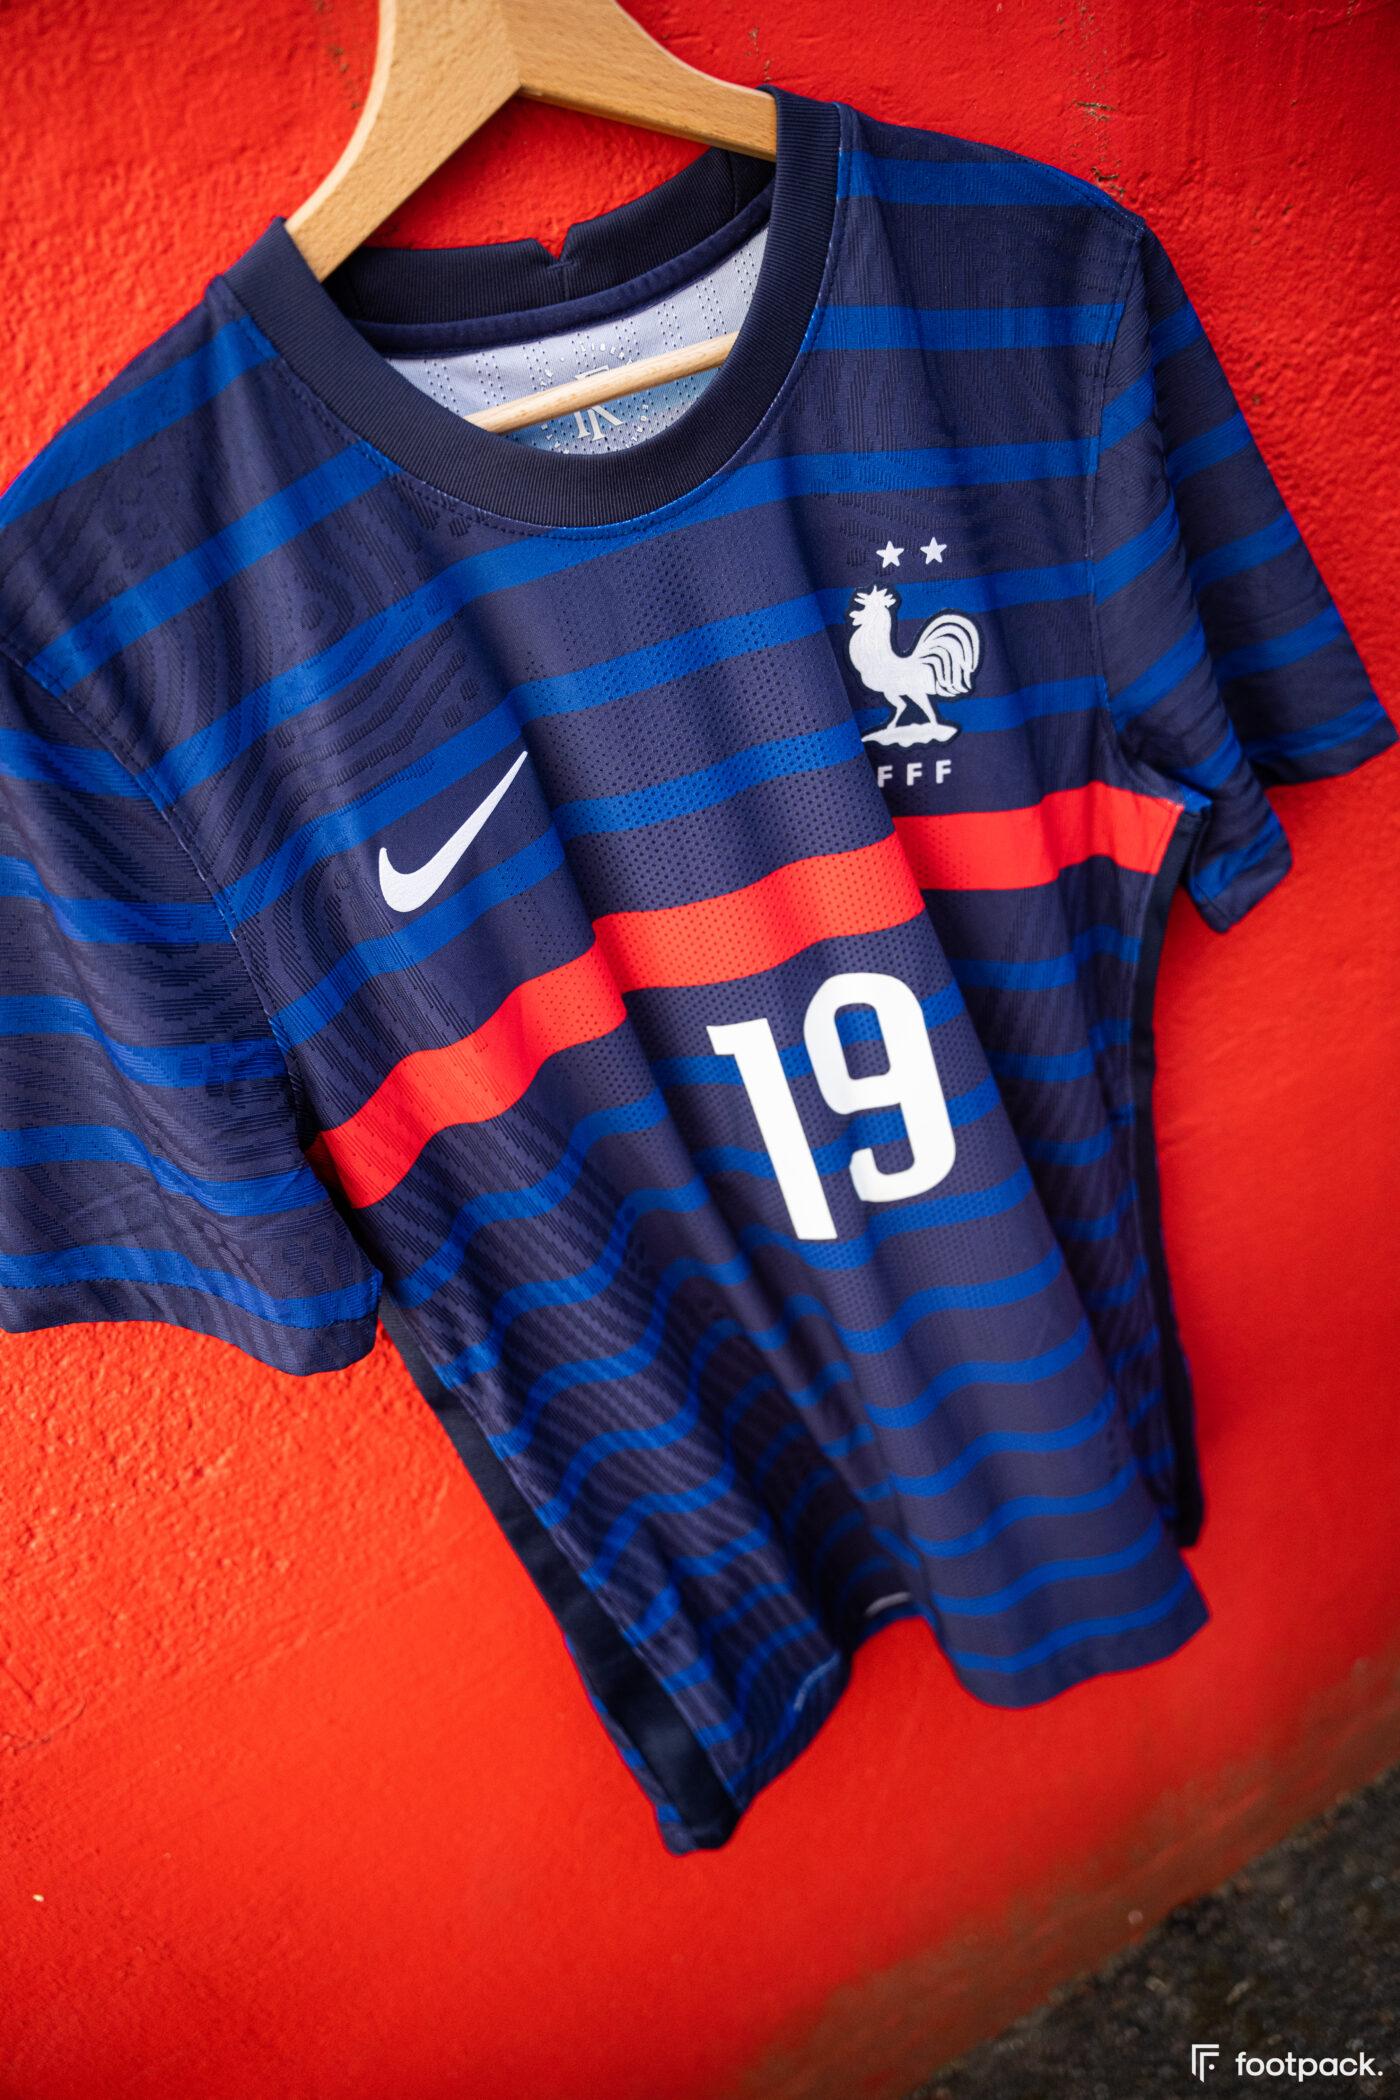 Maillot équipe de France Karim Benzema numéro 19